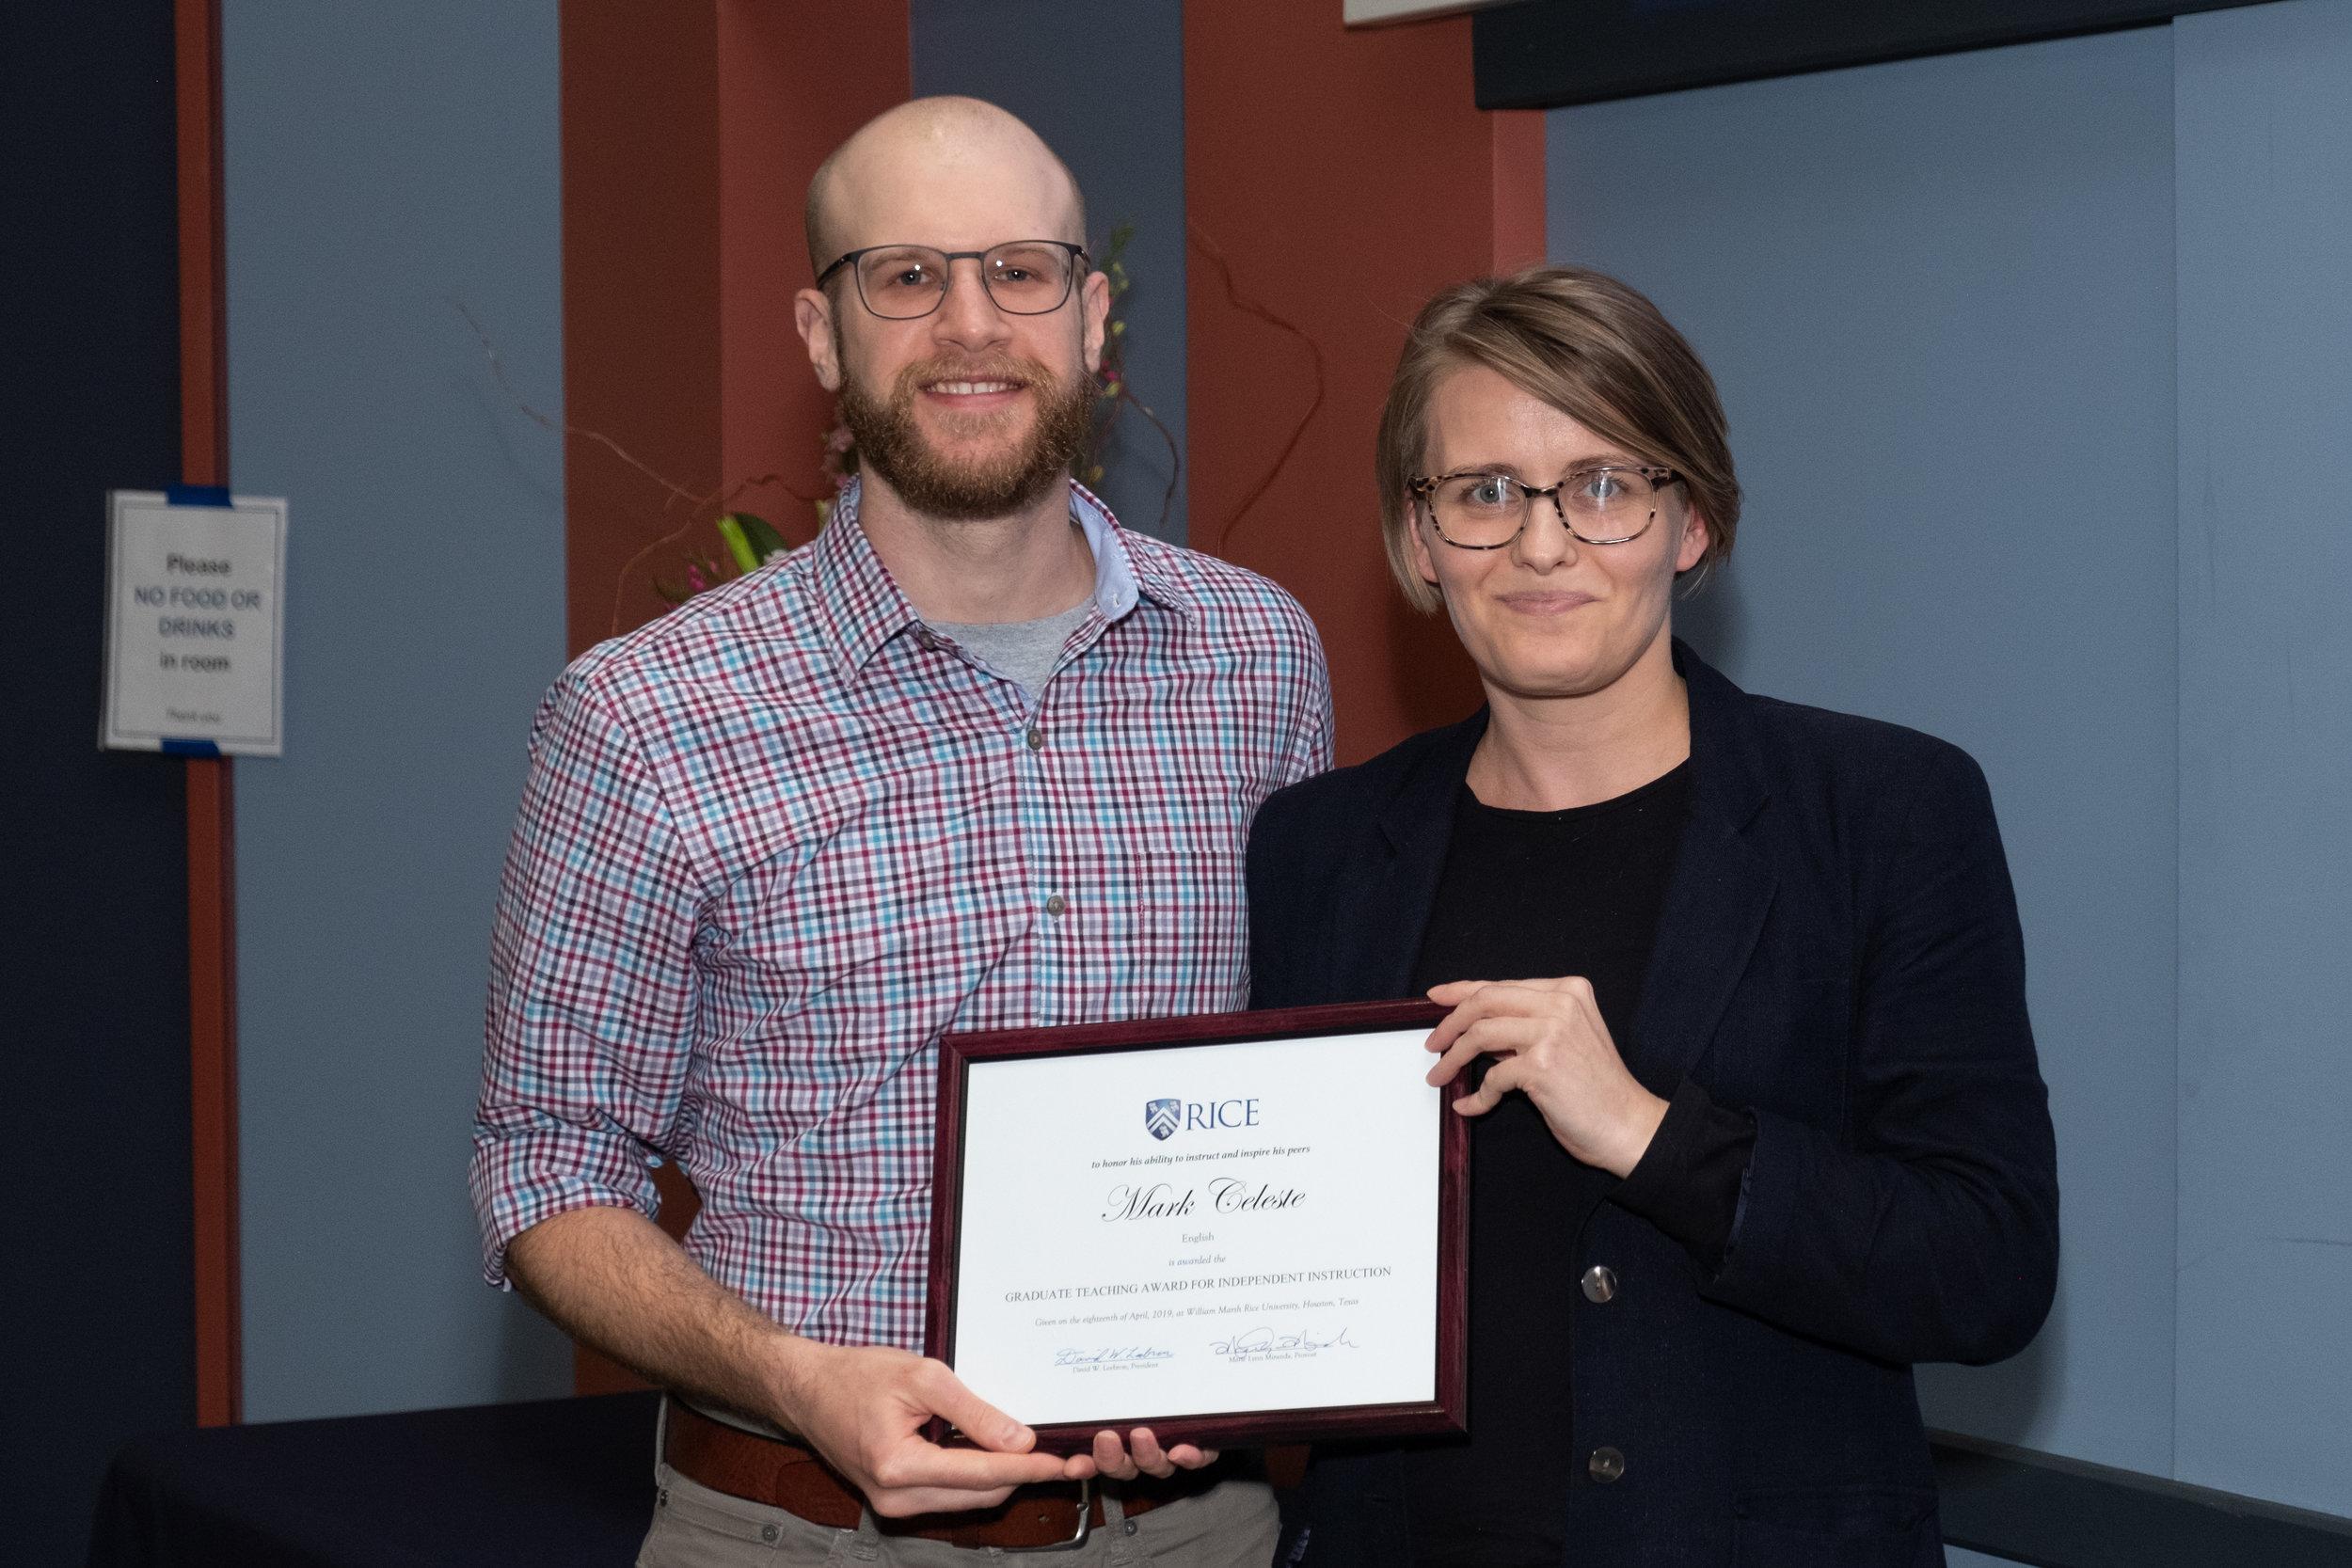 Ania Kowalik, CTE Assistant Director & Mark Celeste, Graduate Teaching Award for Independent Instruction